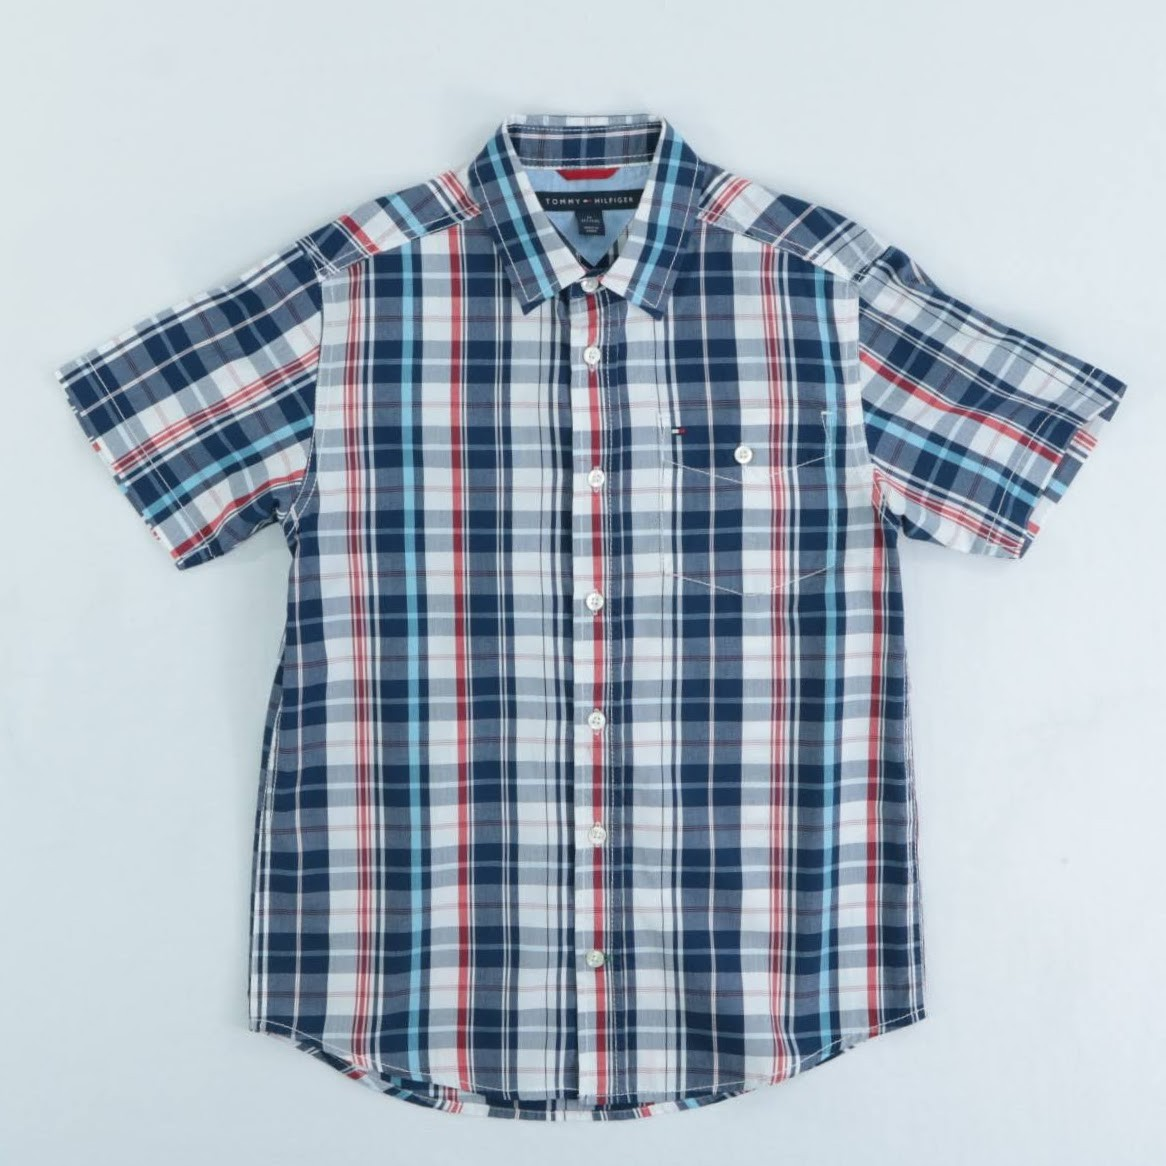 Camisa Tommy Hilfiger - TAM 14 ANOS